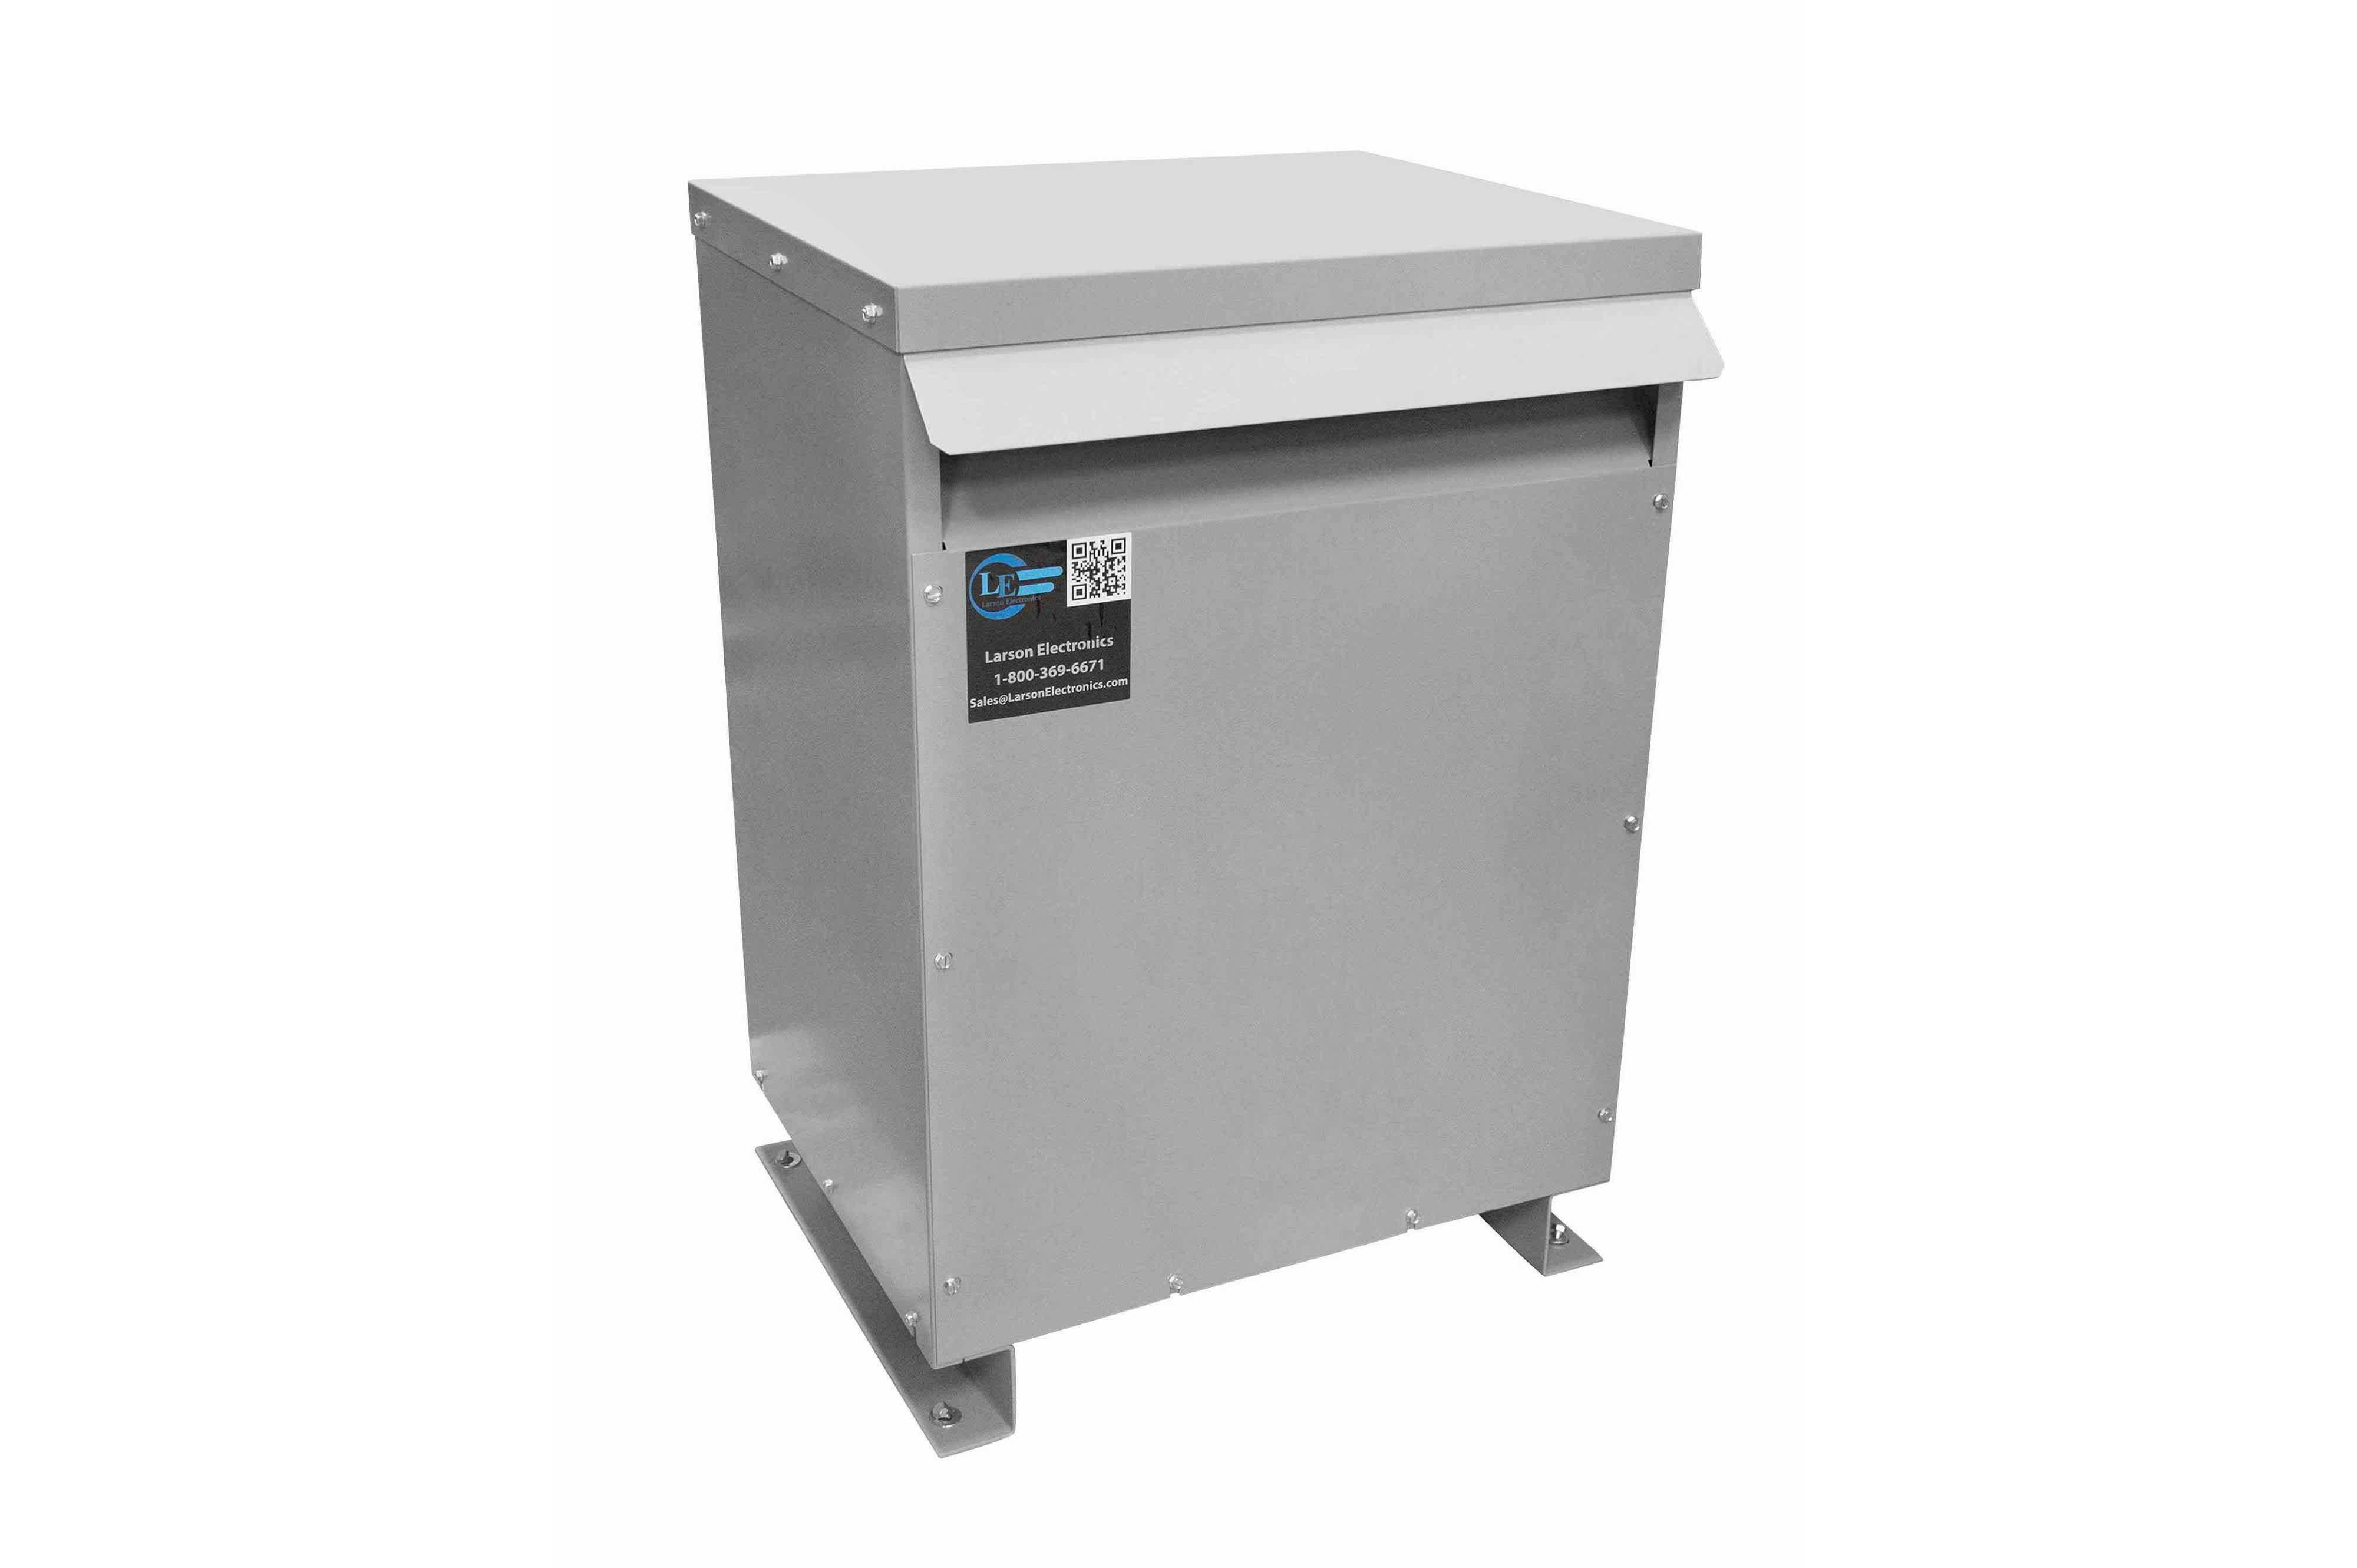 40 kVA 3PH Isolation Transformer, 575V Wye Primary, 240V Delta Secondary, N3R, Ventilated, 60 Hz